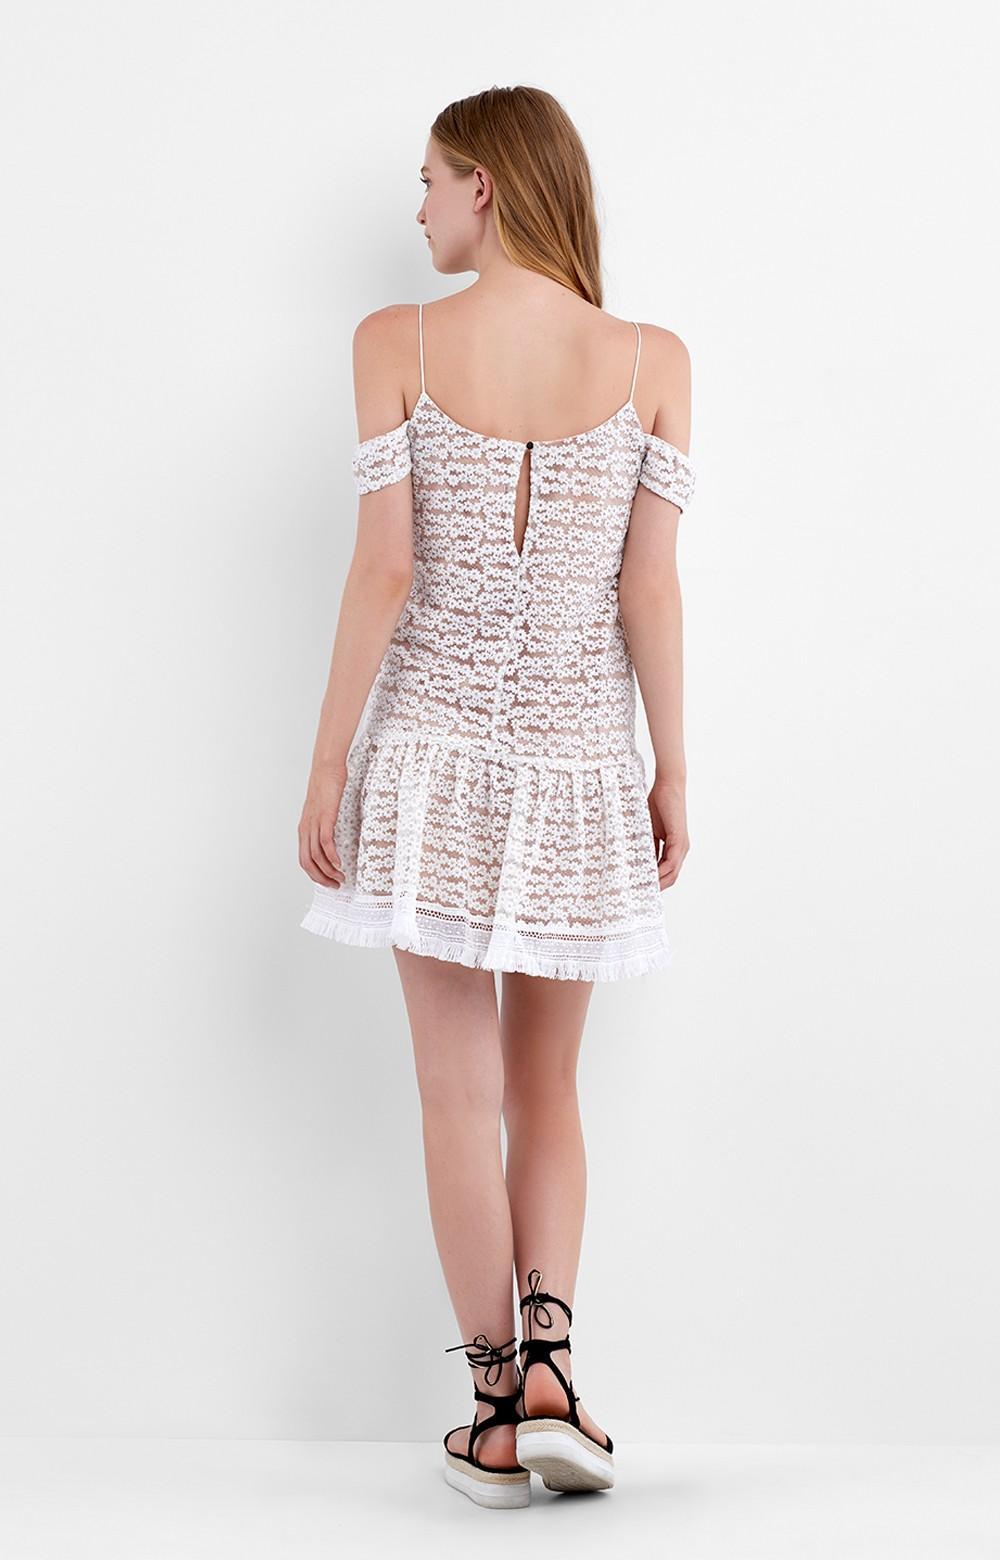 Nicole Miller Baby S Breath Ruffle Dress In White Lyst